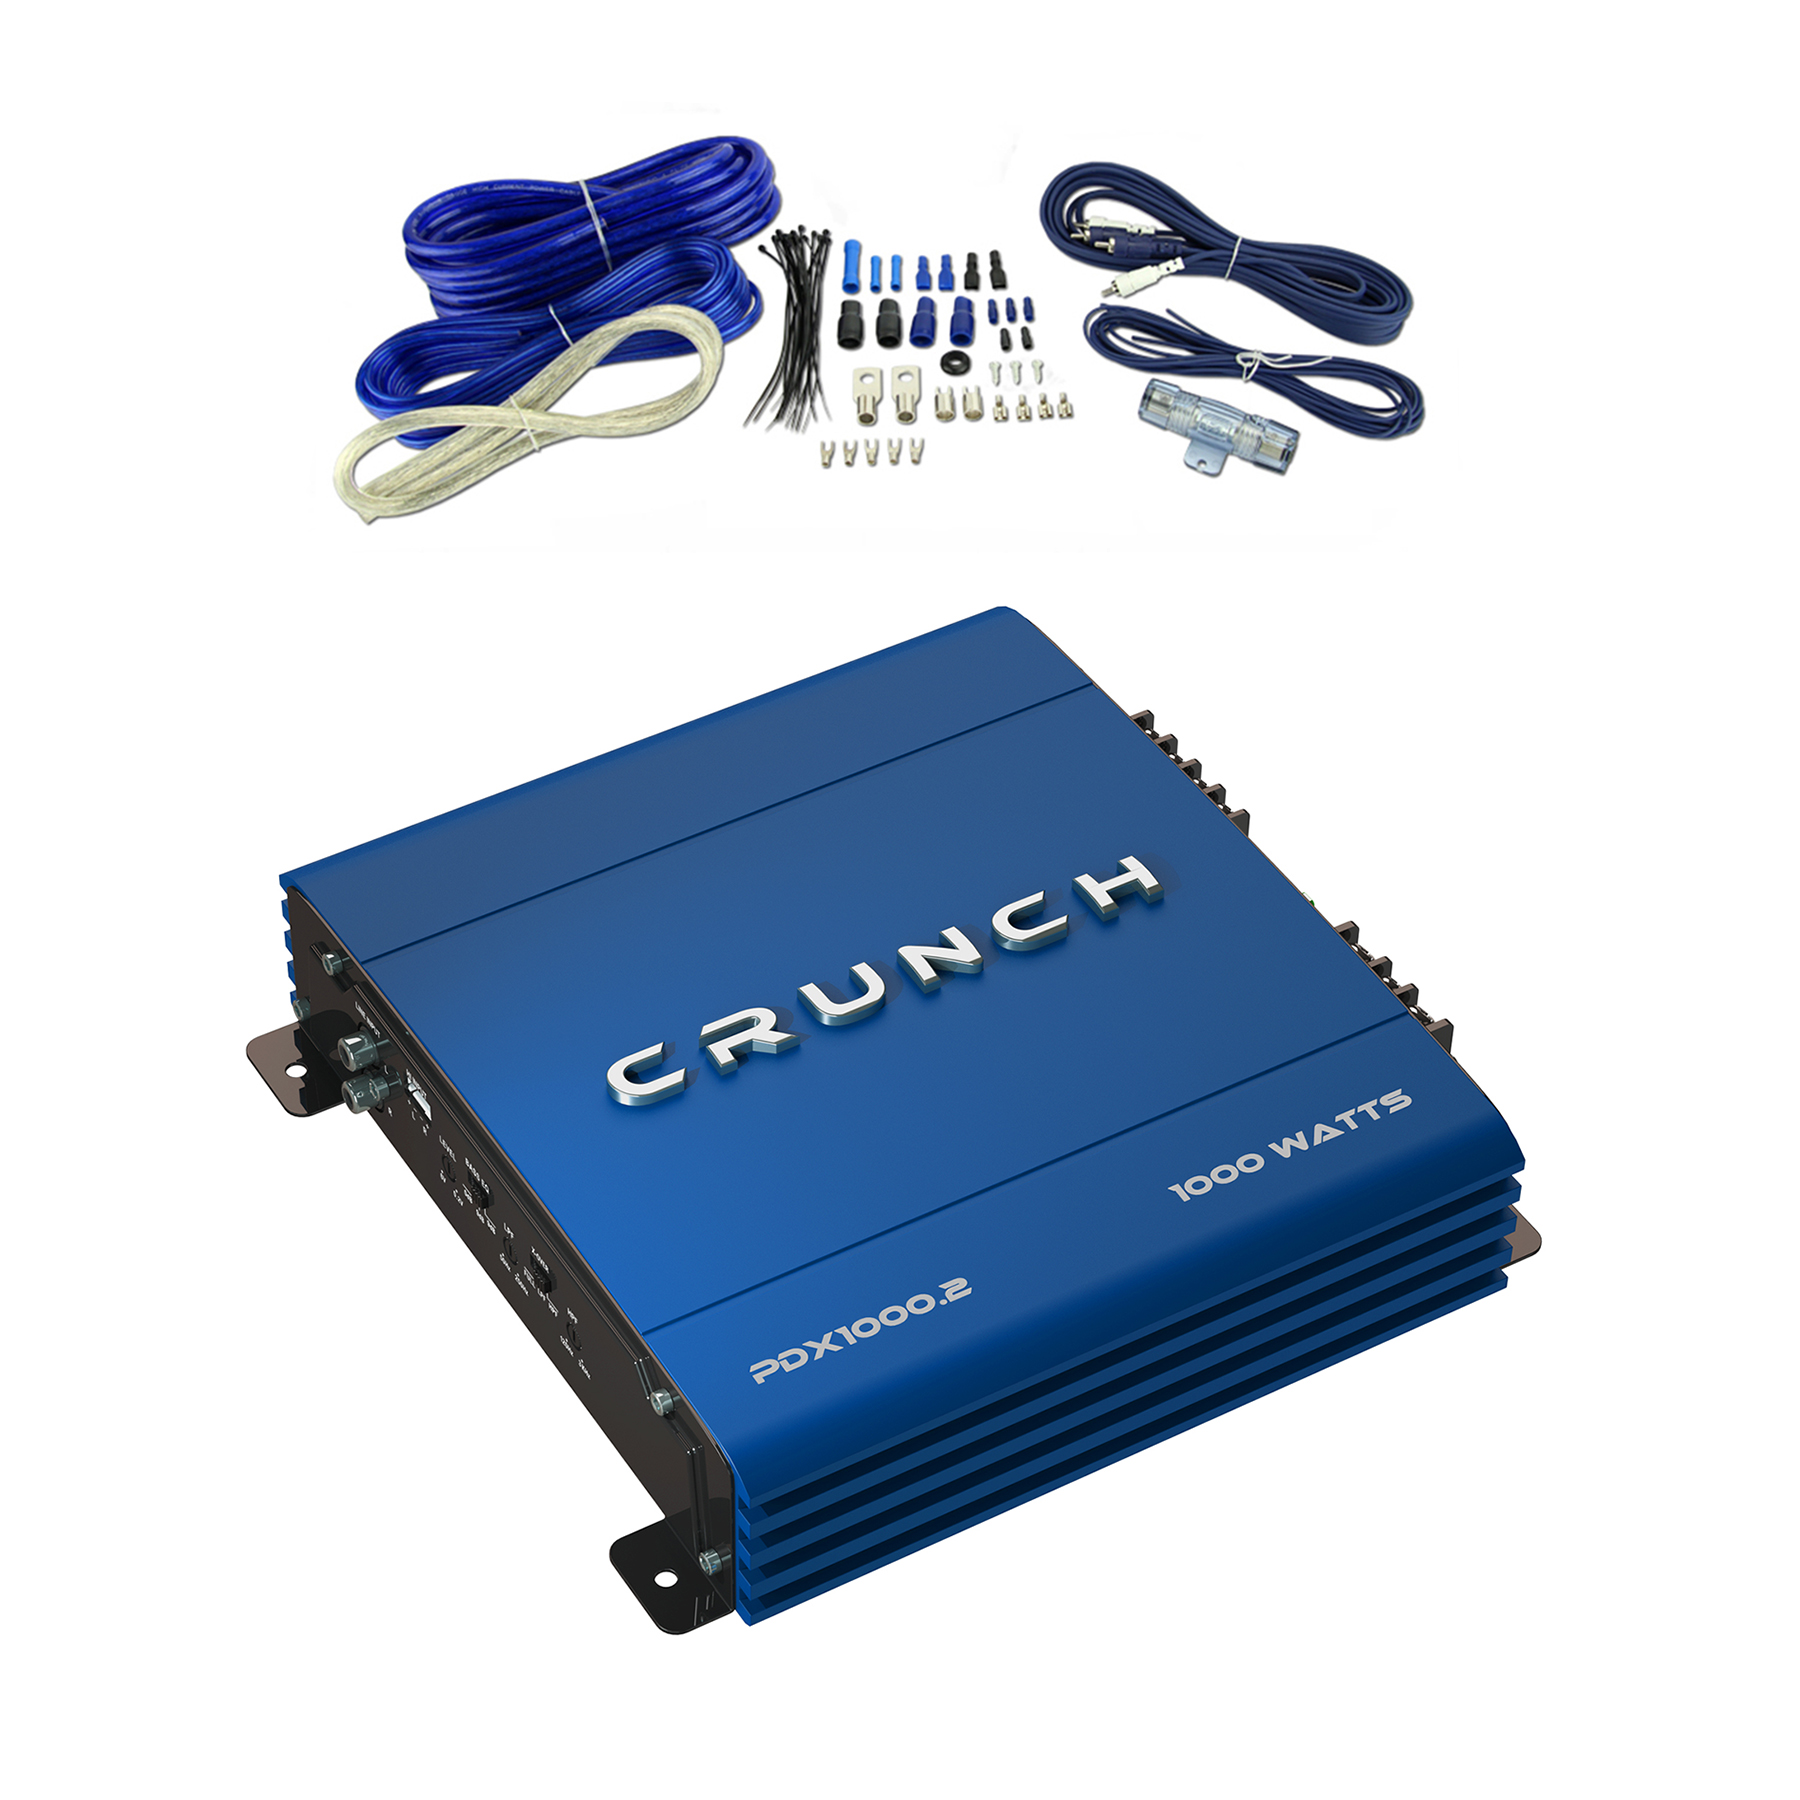 crunch powerdrivex 1000w 2 channel blue a/b car amplifier ... crunch amp wiring diagram 2001 cadillac sts bose amp wiring diagram